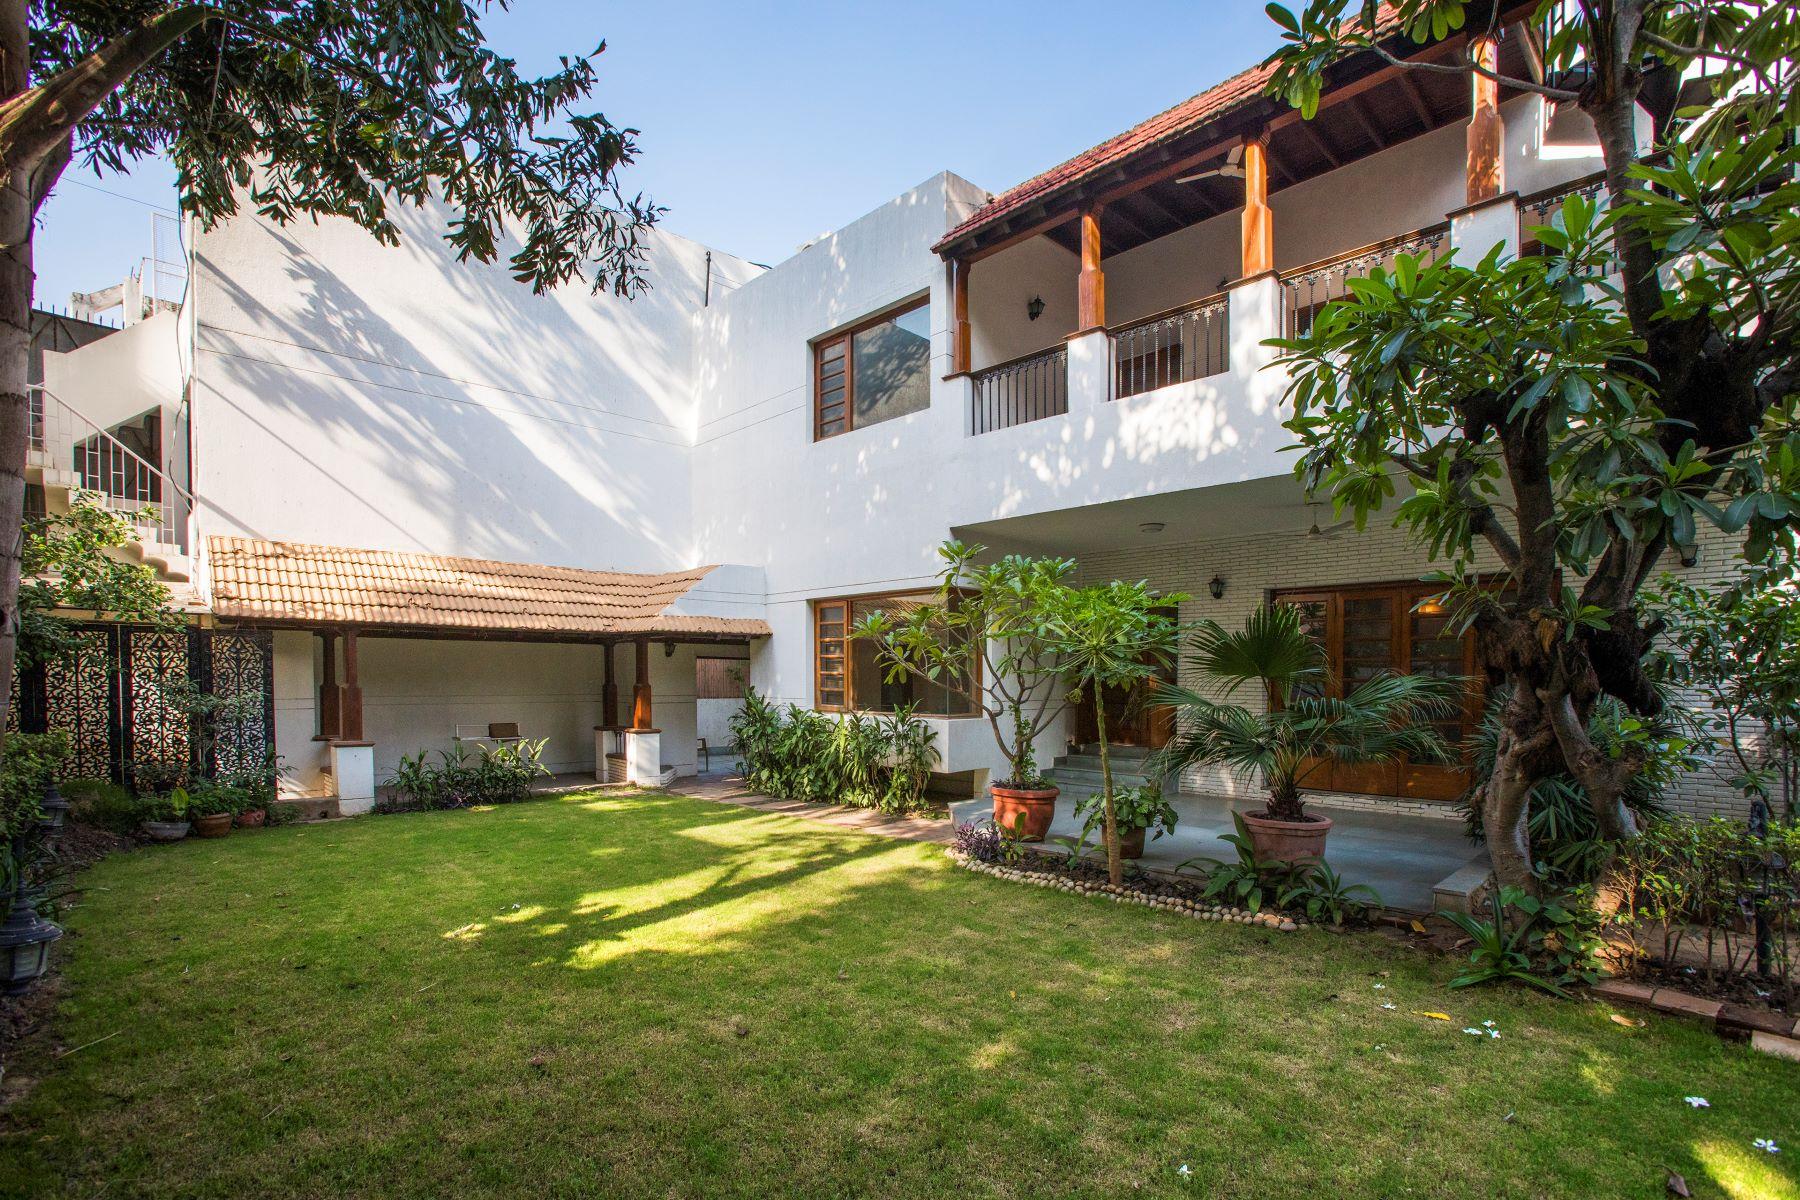 Other Residential for Sale at Panchsheel Park- Lavish Bungalow Panchsheel Park New Delhi, Delhi 110017 India